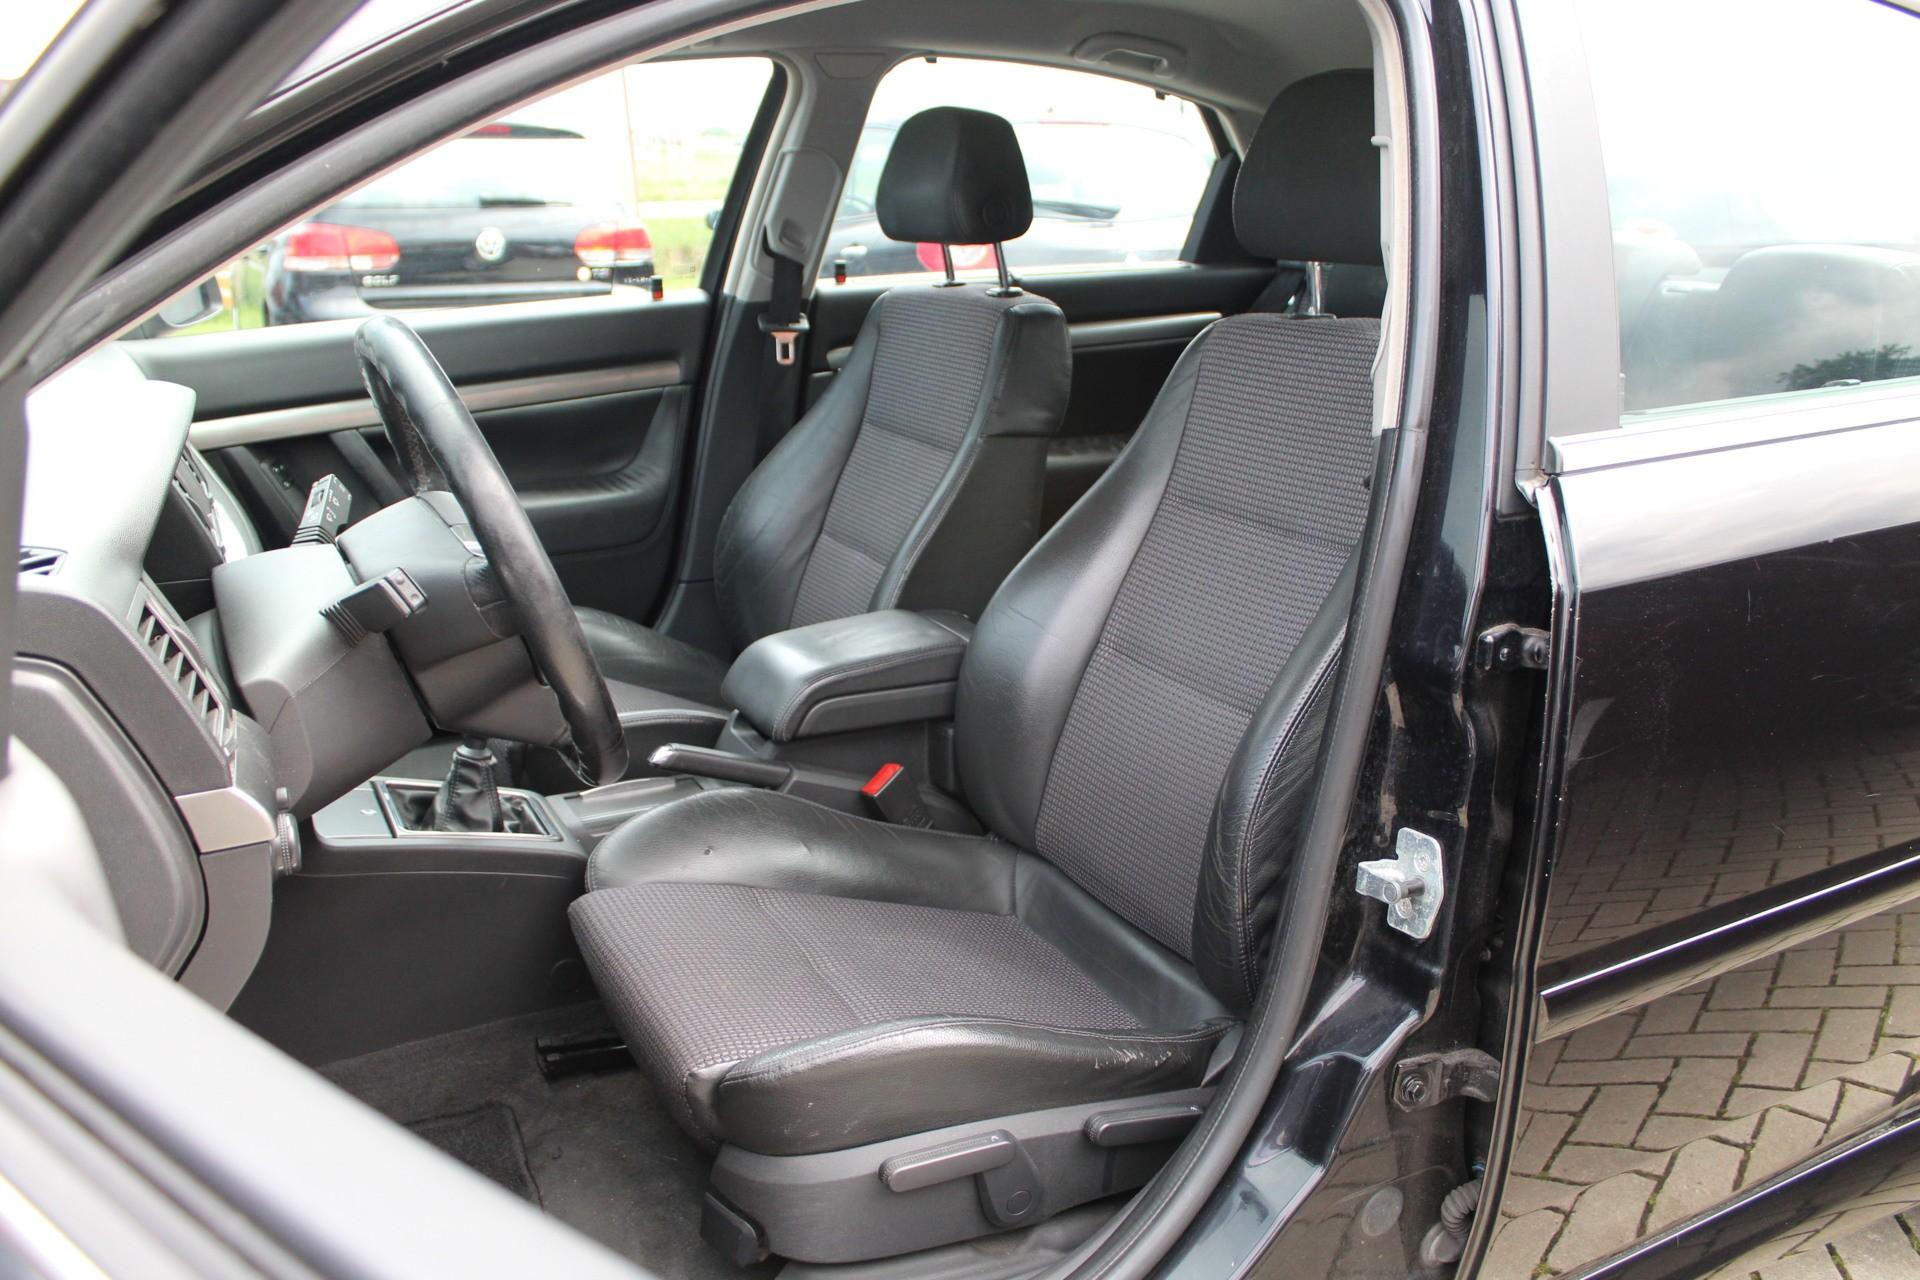 Caroutlet Groningen - Opel Vectra GTS 1.8-16V Elegance | APK 02-2021 | INRUILKOOPJE | CLIMA